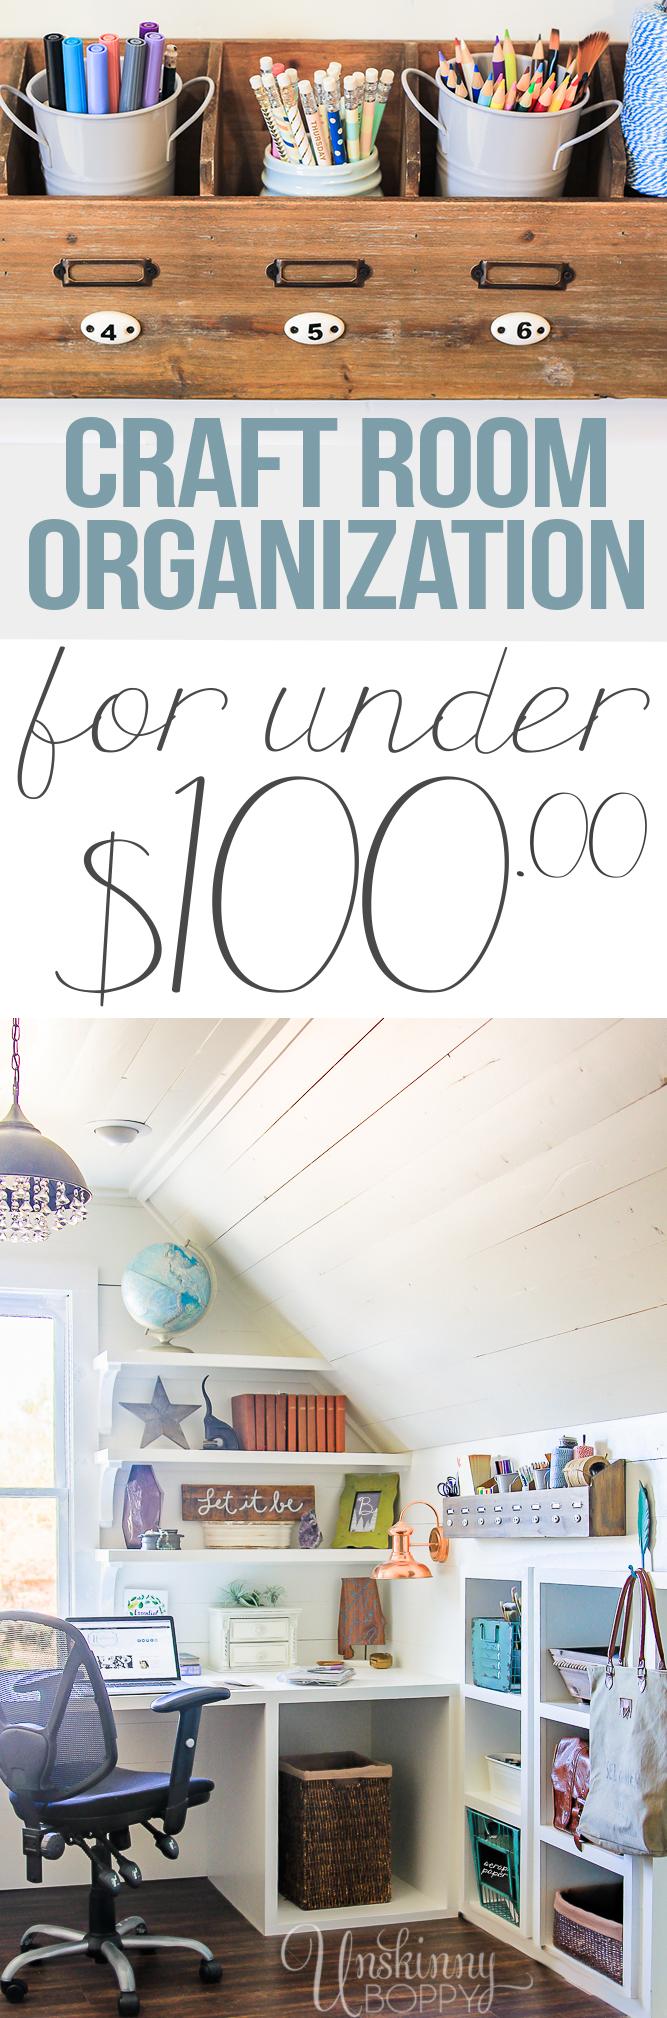 Hobby Lobby Craft Room organization under $100